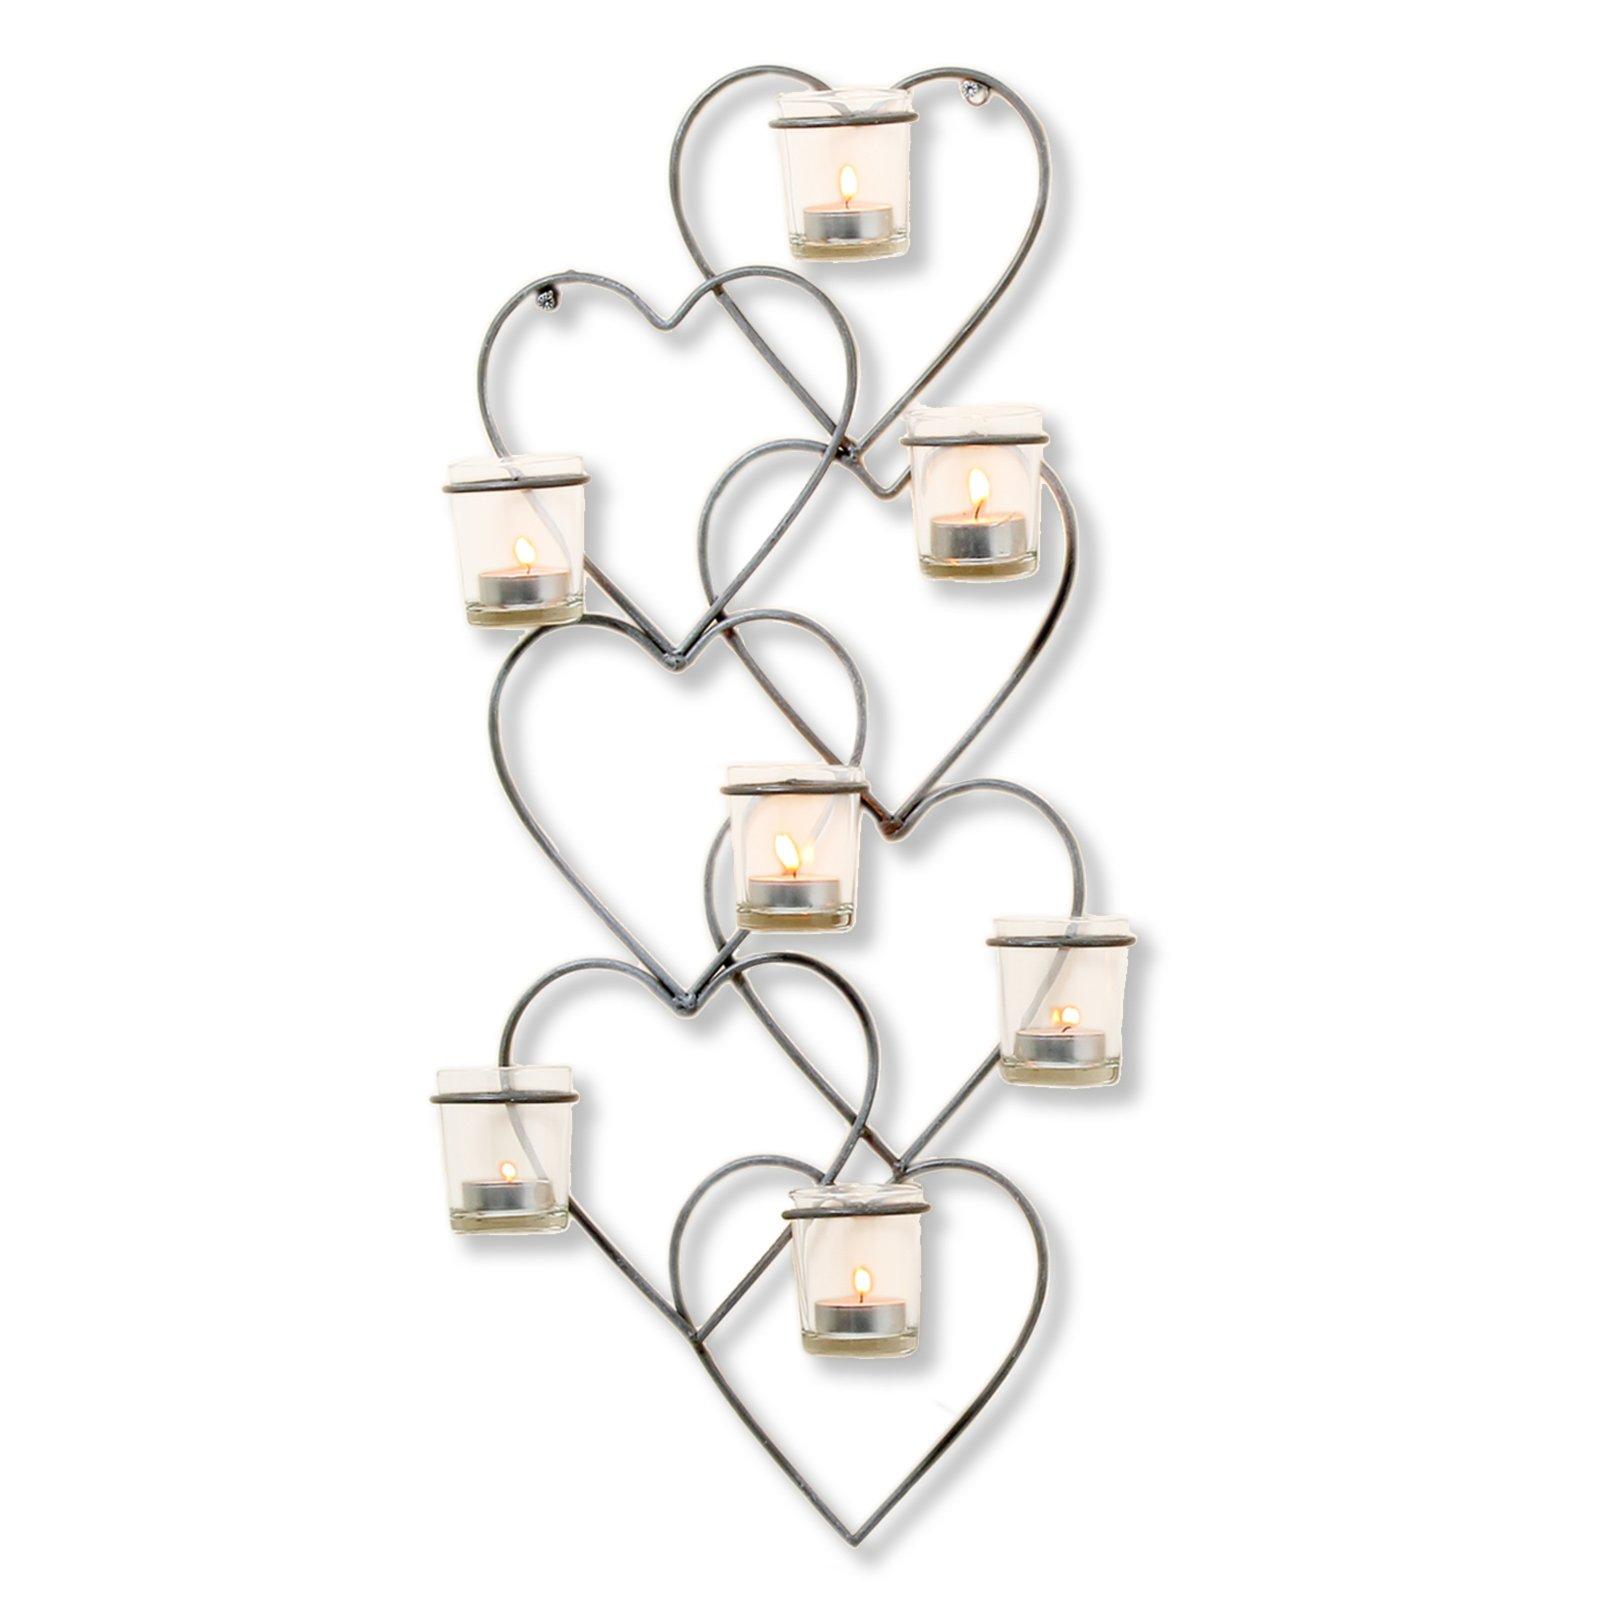 Wand-Teelichthalter - anthrazit - 7 Teelichtgläser | Kerzen & Kerzenhalter | Deko ...